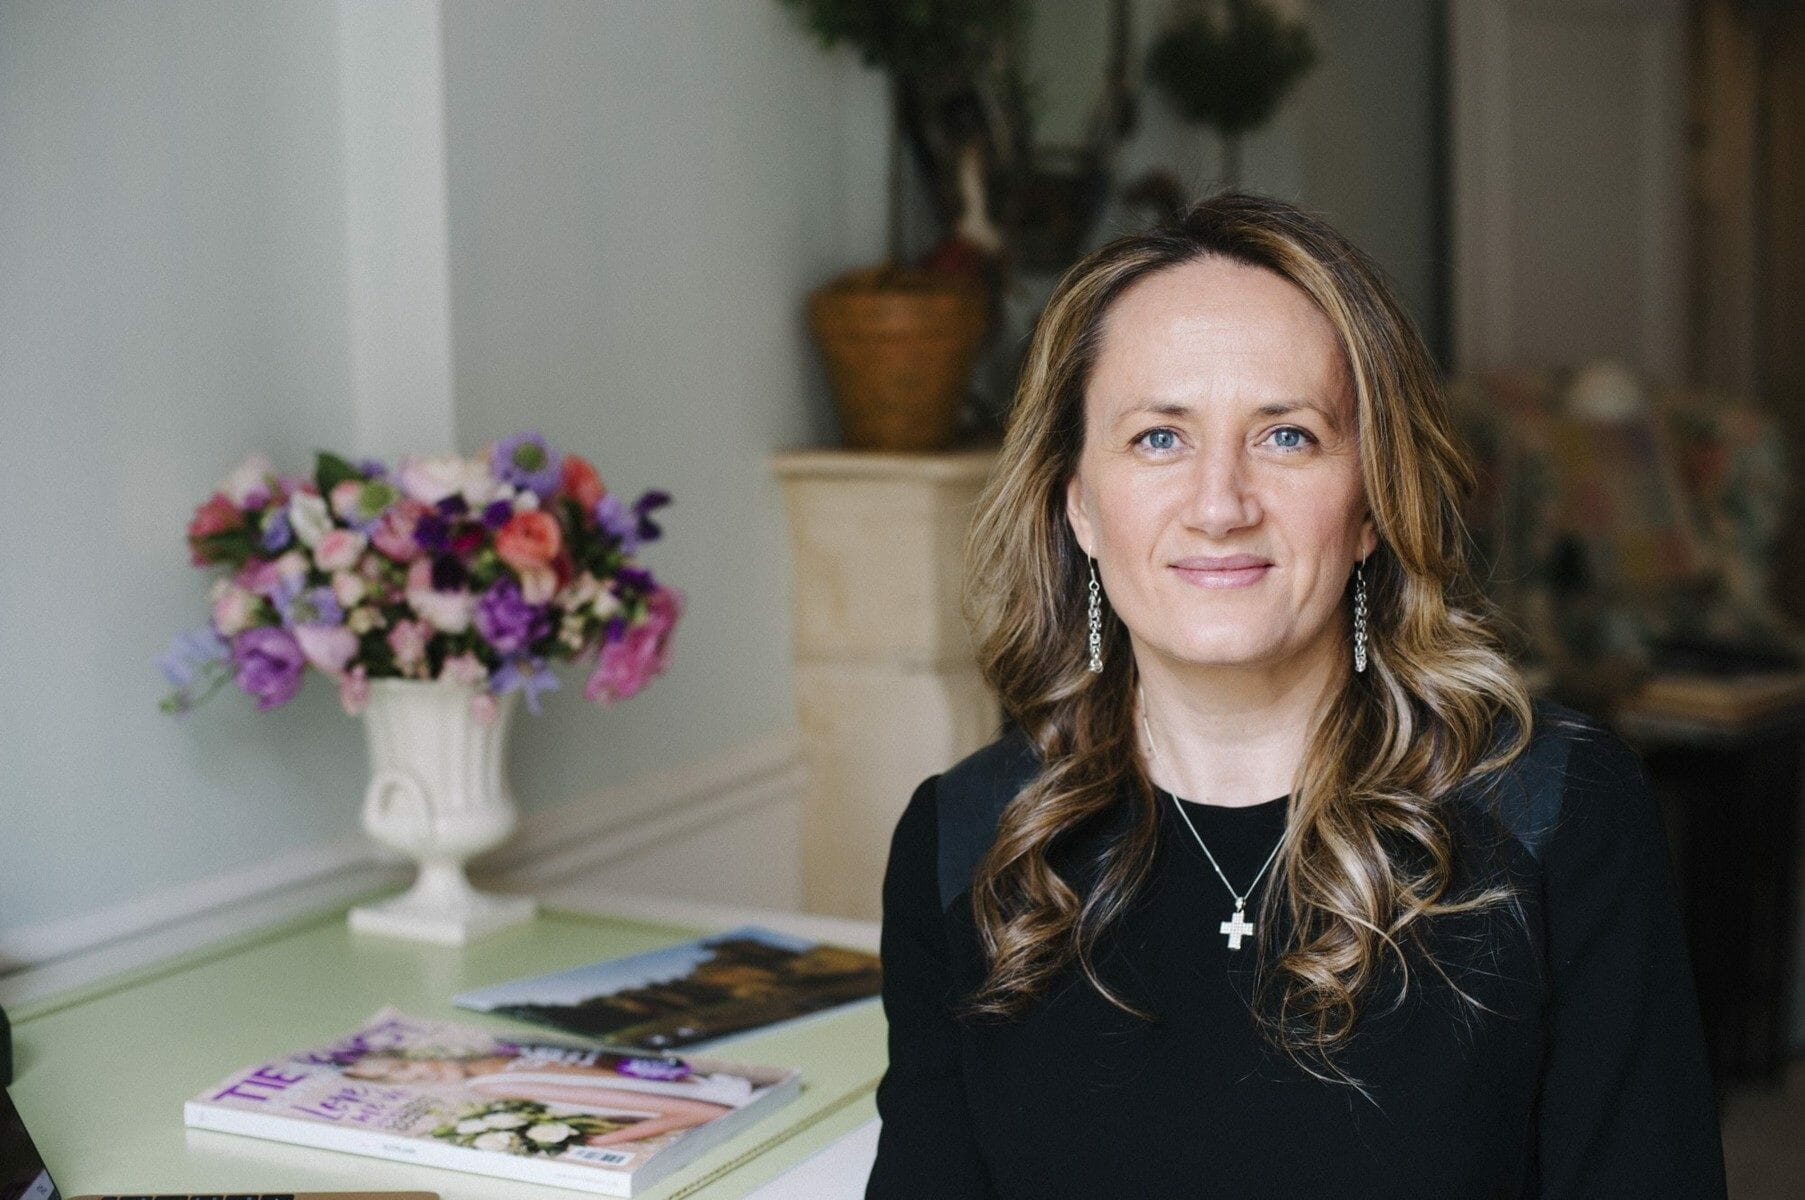 Lisa Bauer